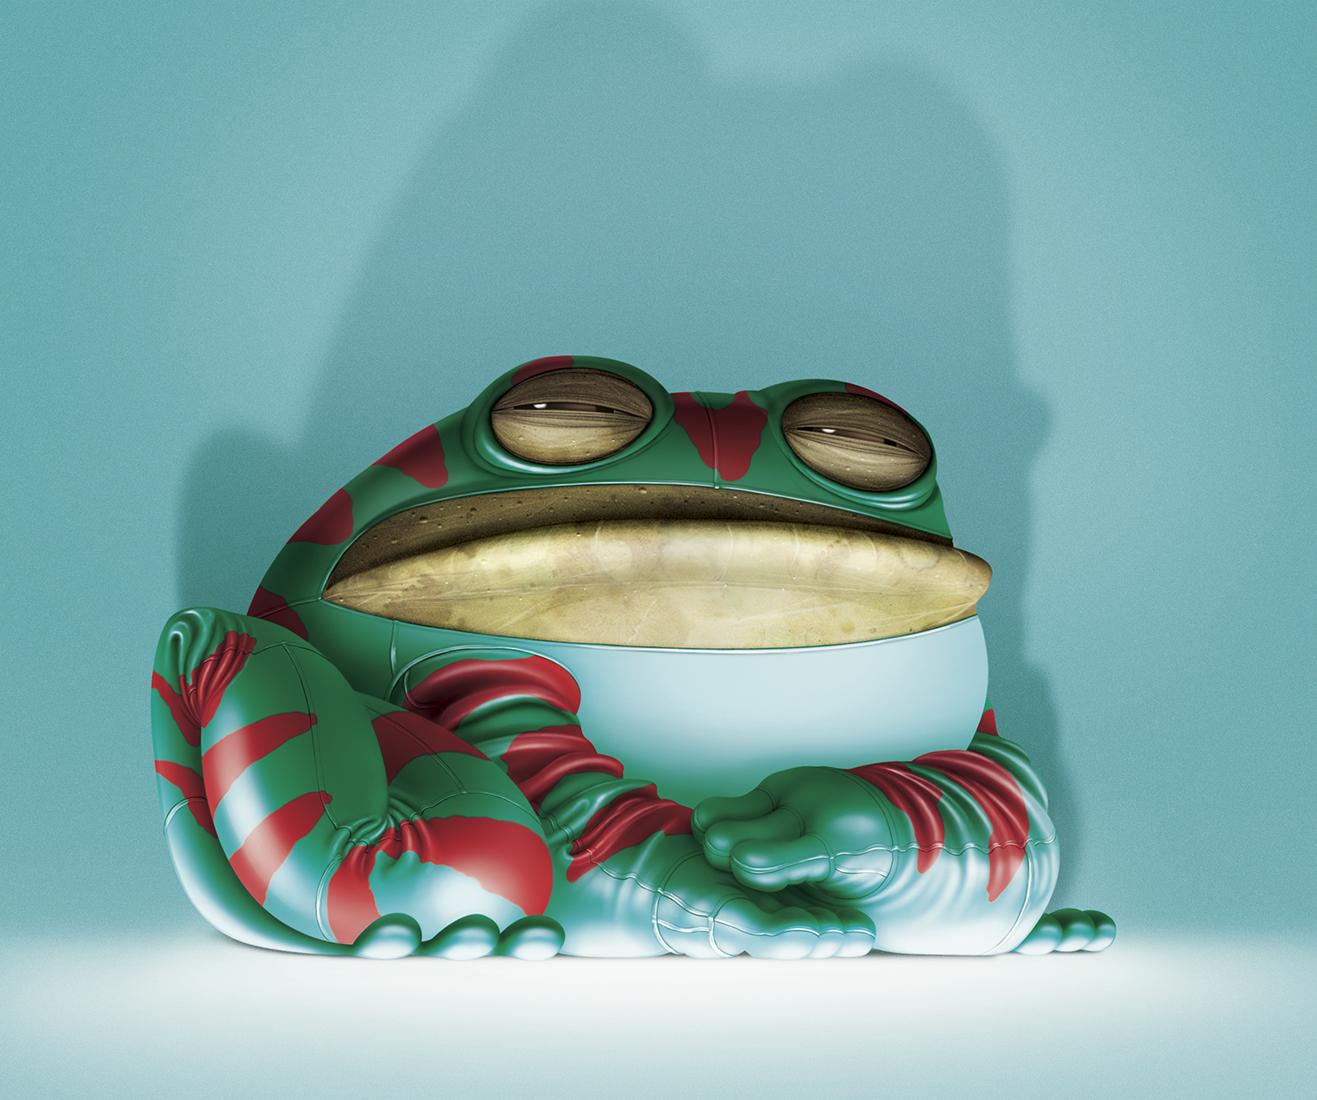 rubberfrog_1500